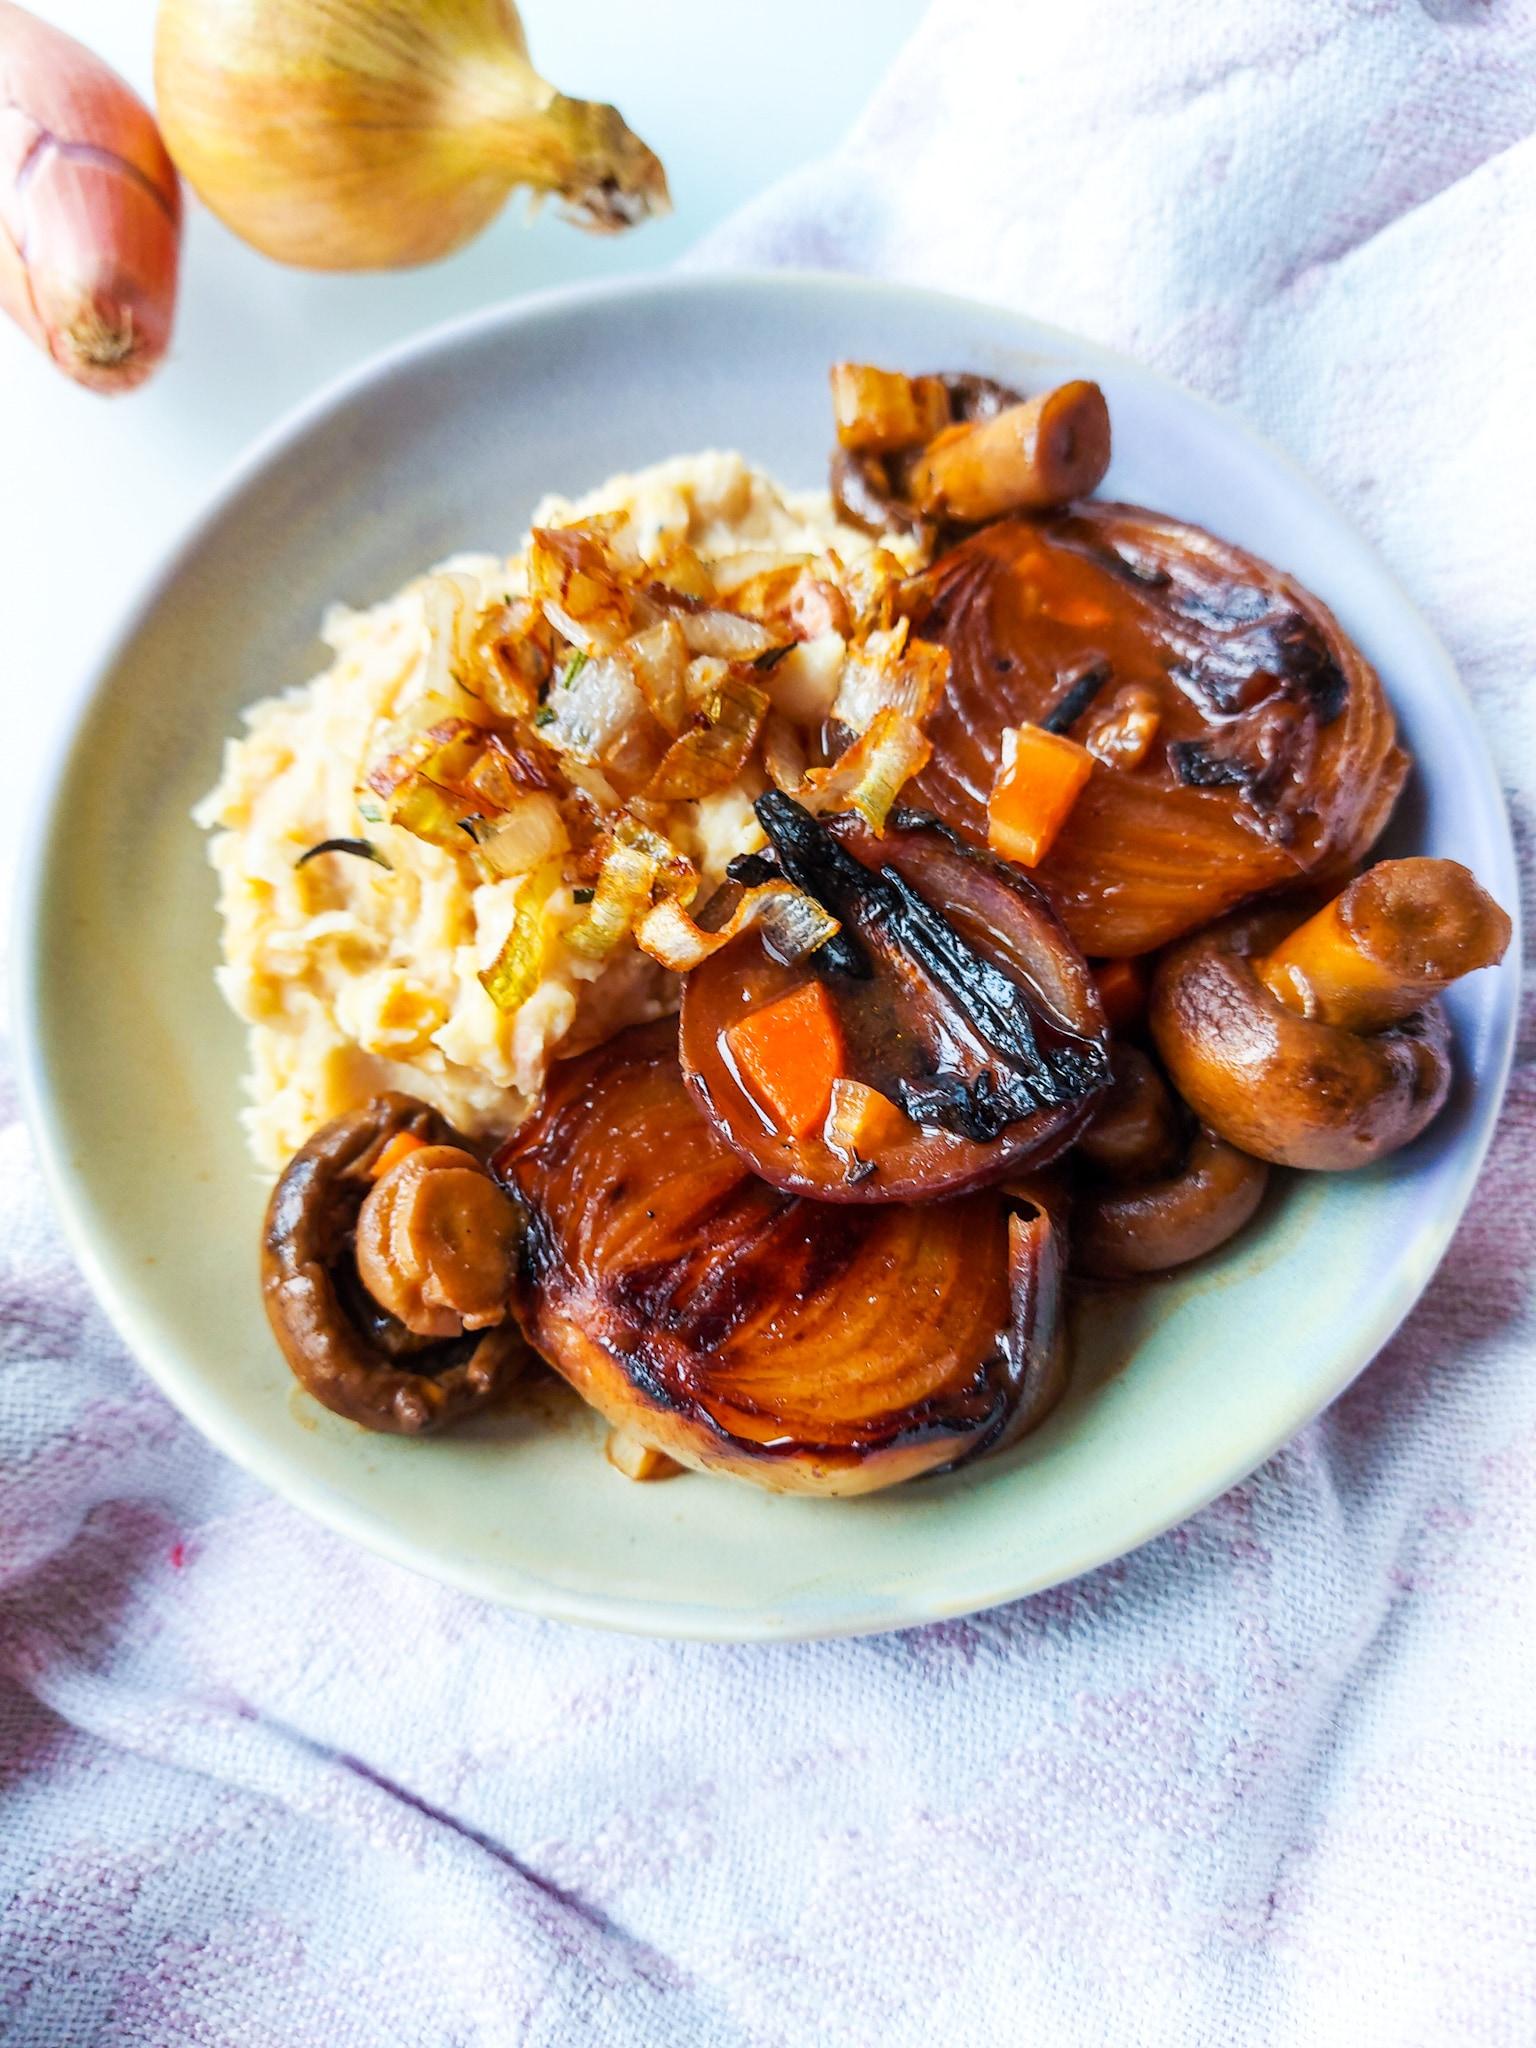 Onion Bourguignon met Witte bonen puree